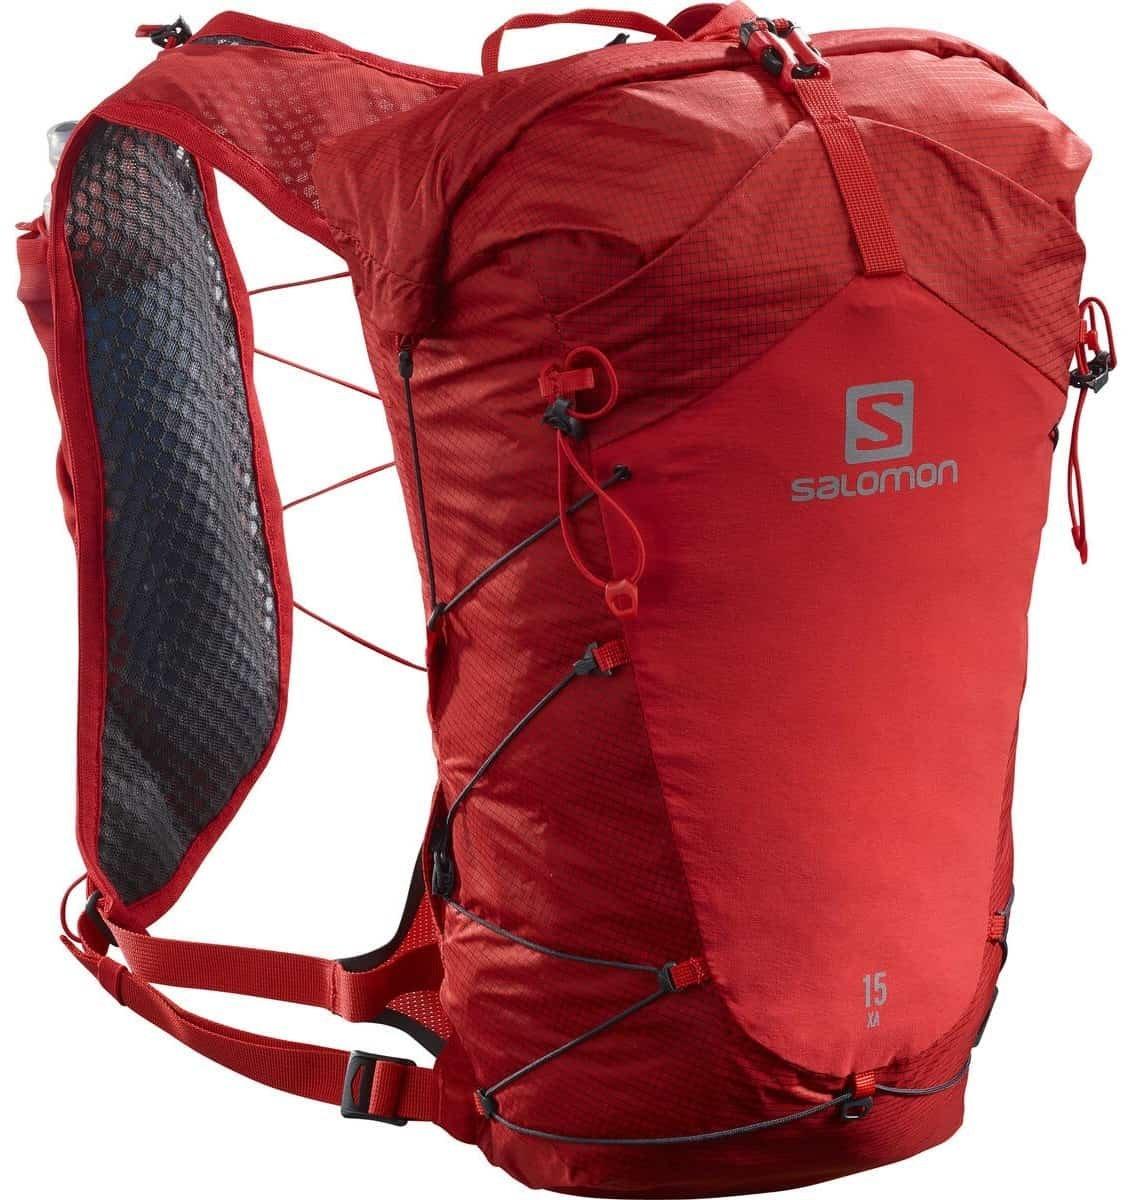 Salomon XA 15 Set S